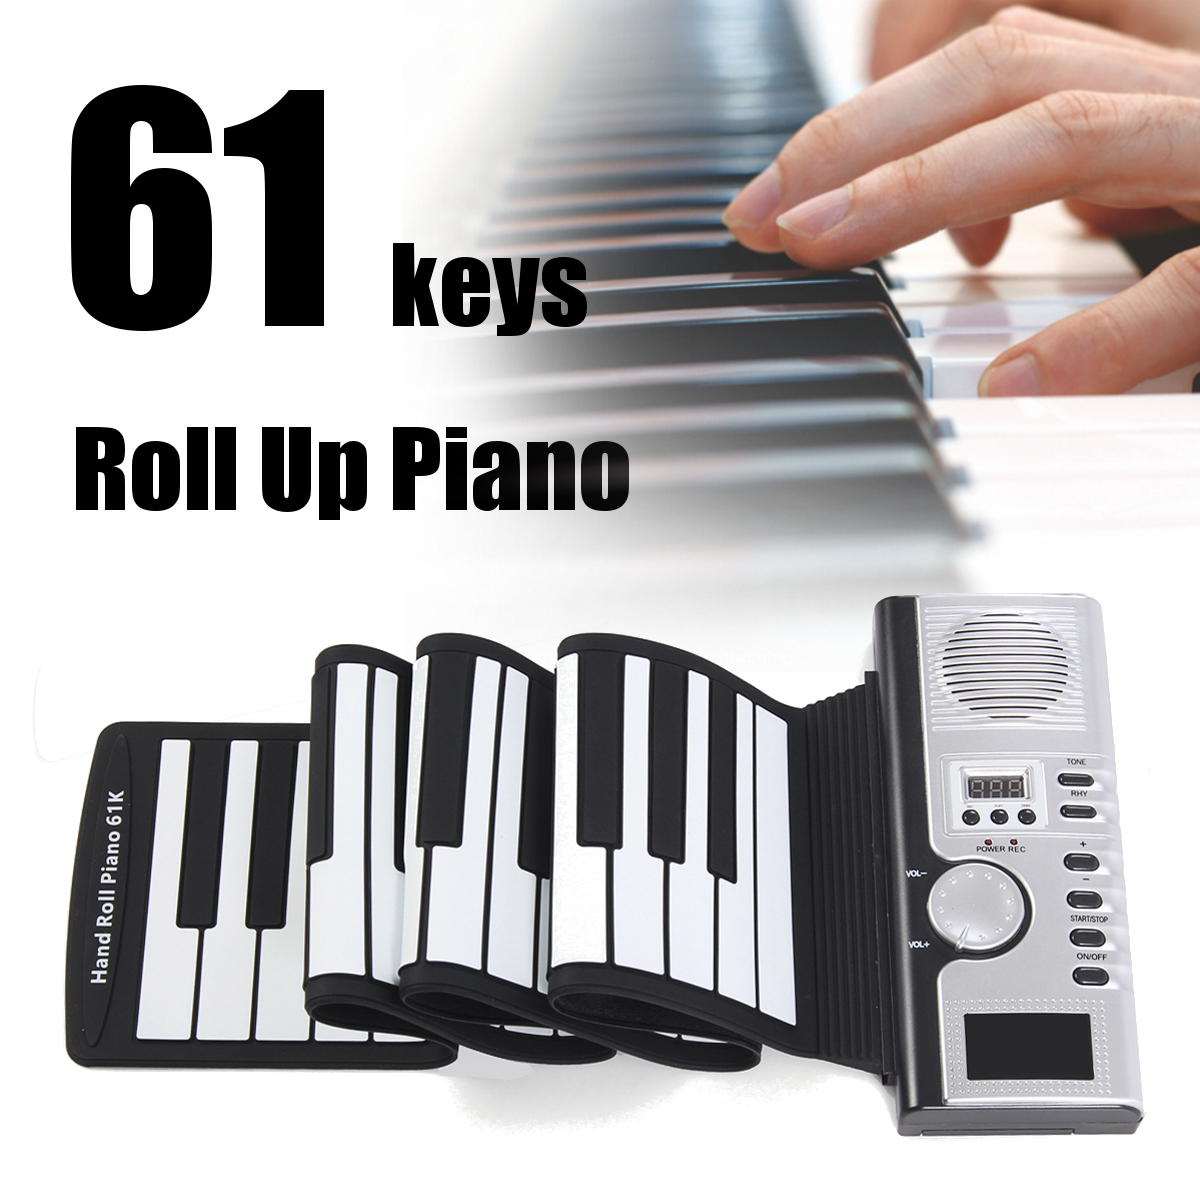 Portable Piano Digital Electronic Black and White 61 Keys Universal Flexible Roll Up Soft Keyboard Piano Children Student Gift футболка классическая printio the black keys